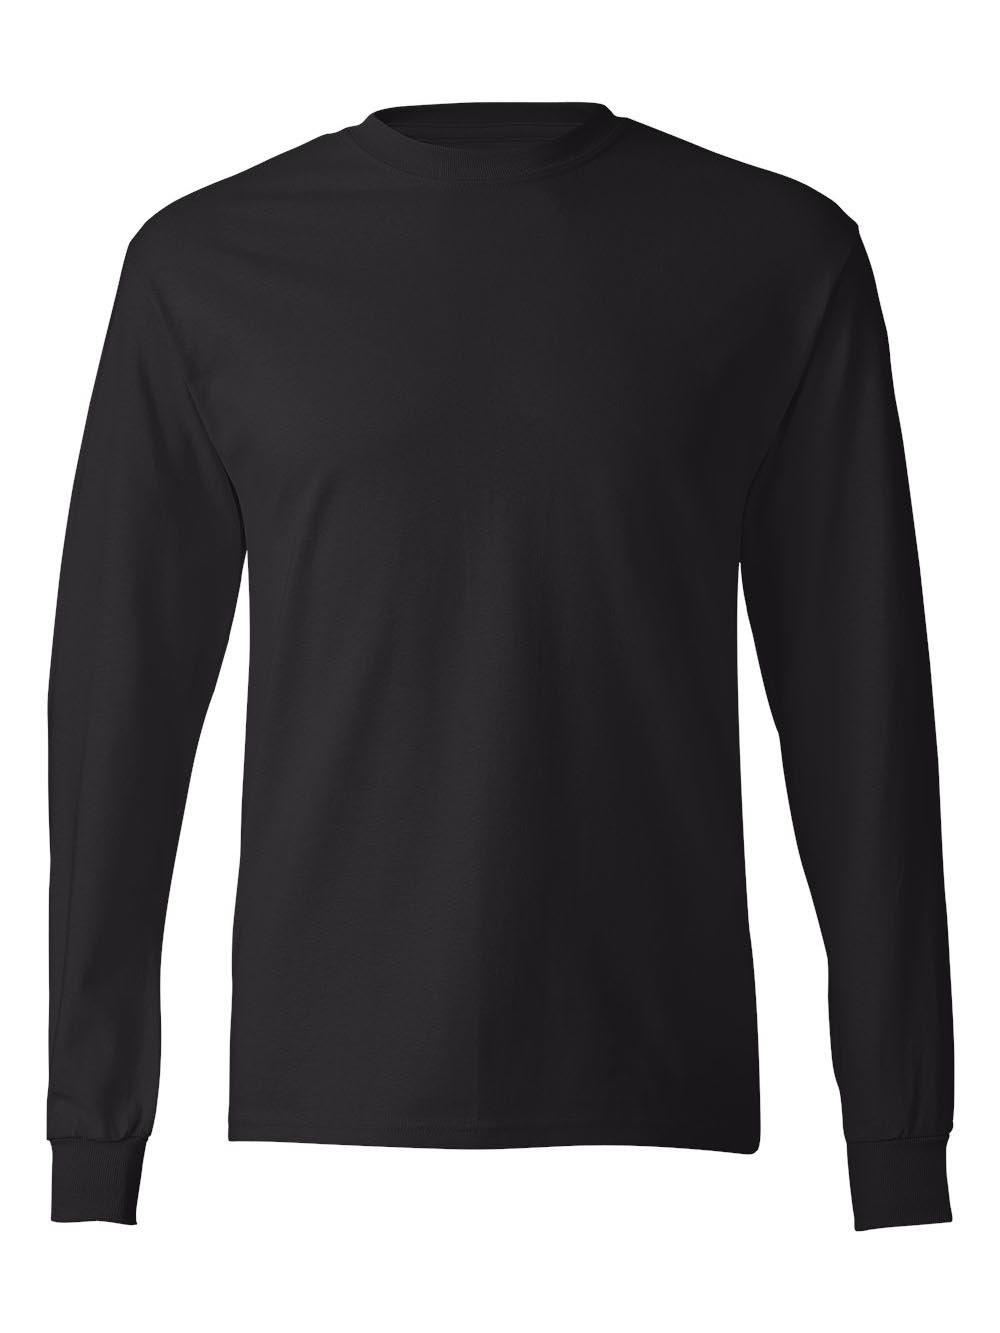 Hanes TAGLESS 6.1 Long Sleeve T-Shirt (Black, XXL)